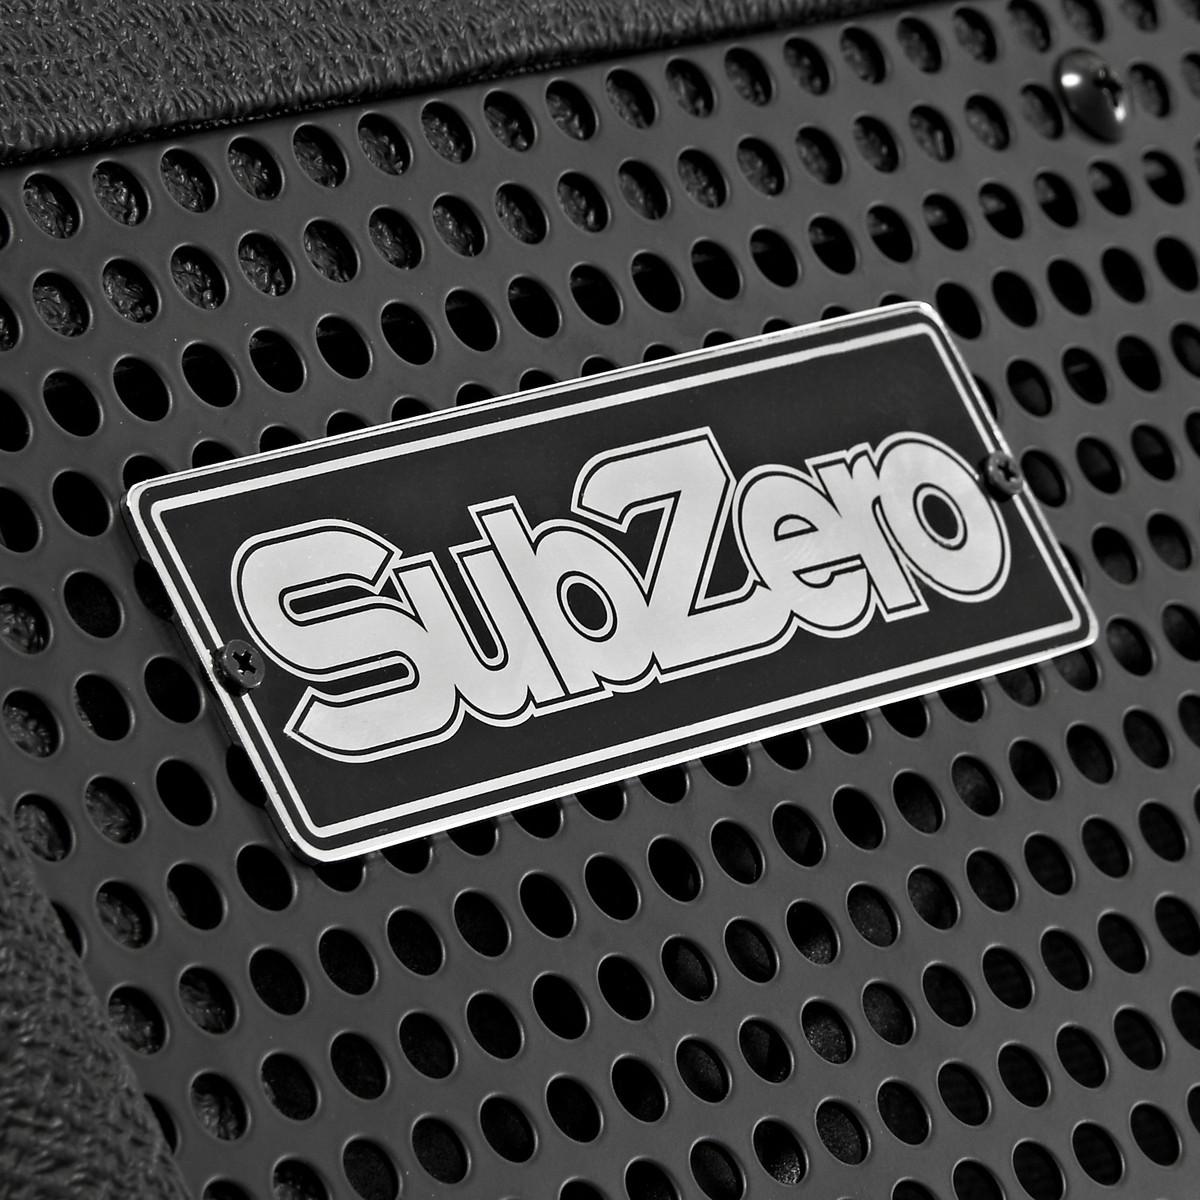 subzero dr 60 drum keyboard amp at gear4music. Black Bedroom Furniture Sets. Home Design Ideas